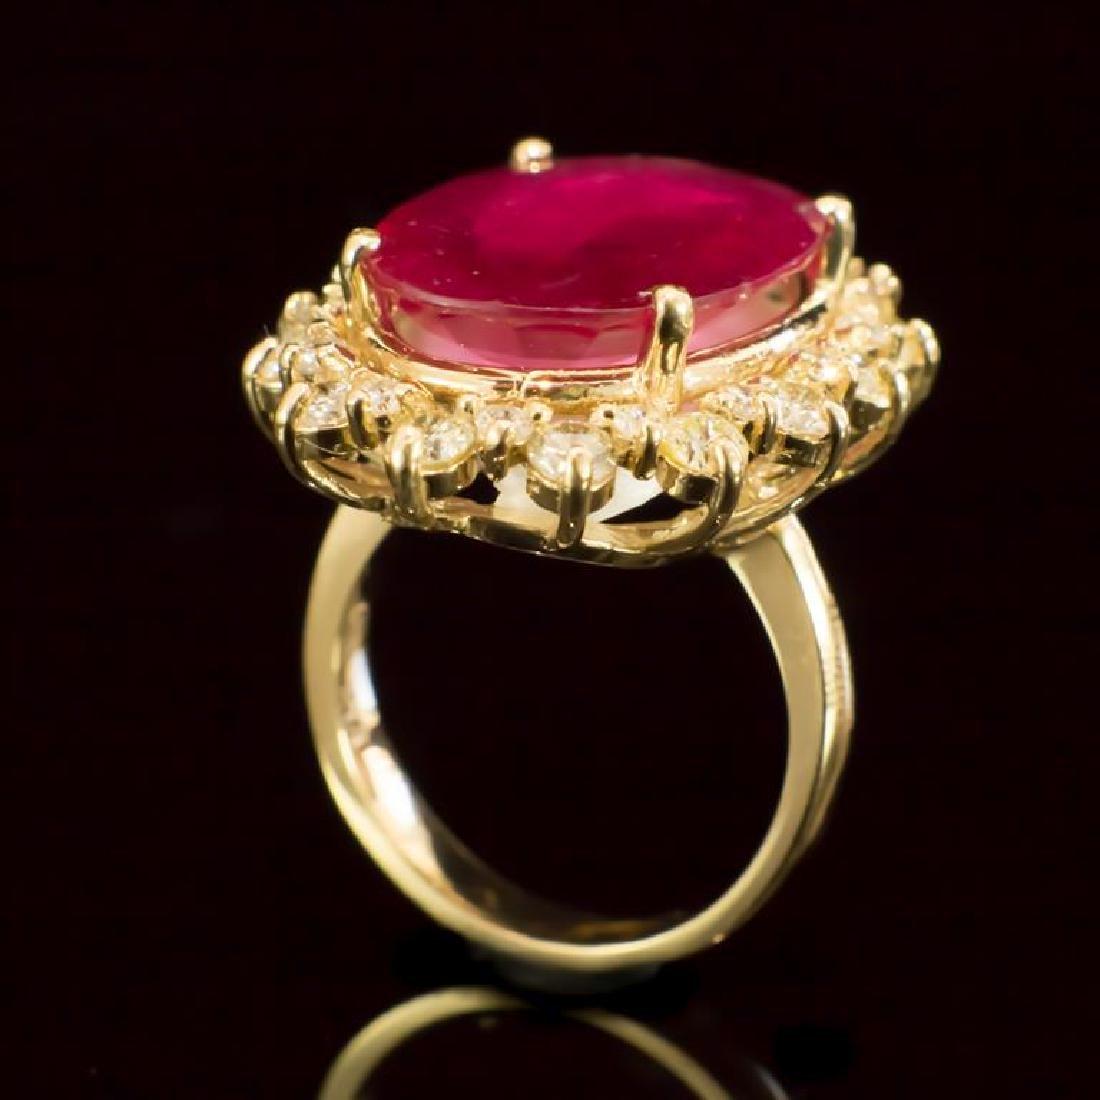 14K Gold 14.81ct Ruby 2.10ct Diamond Ring - 3